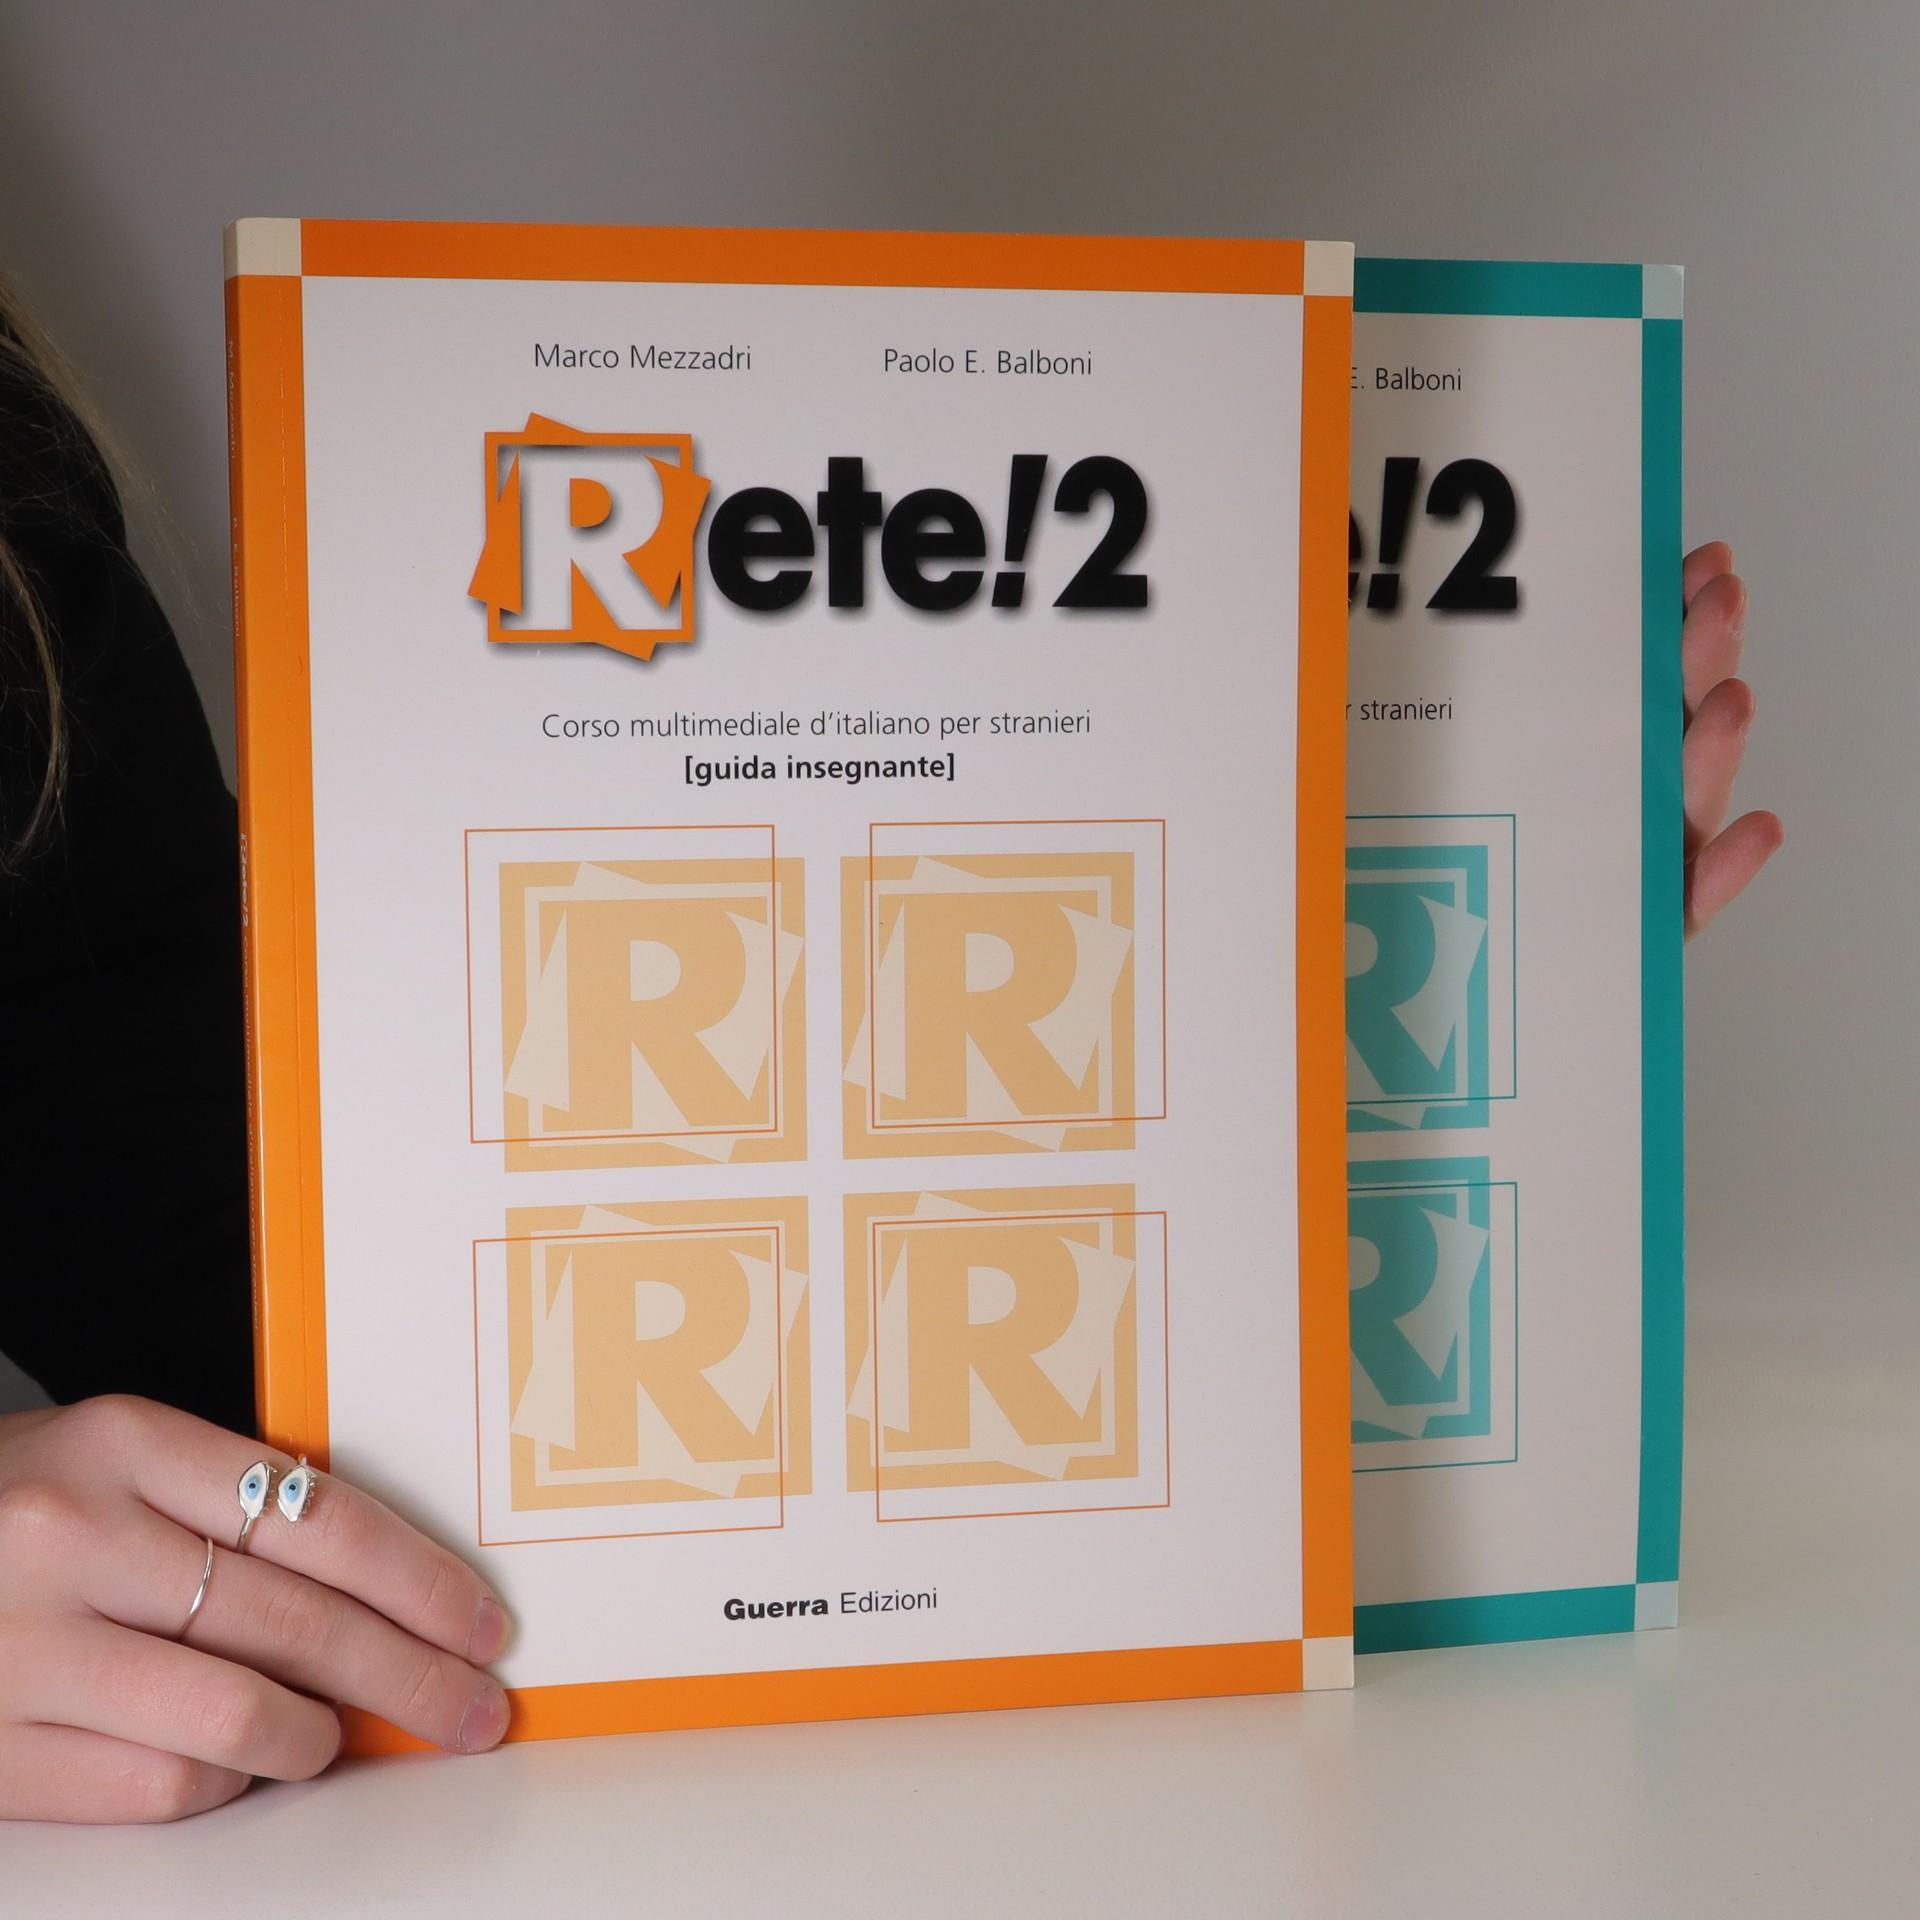 antikvární kniha Rete! 2, 2010, 2012